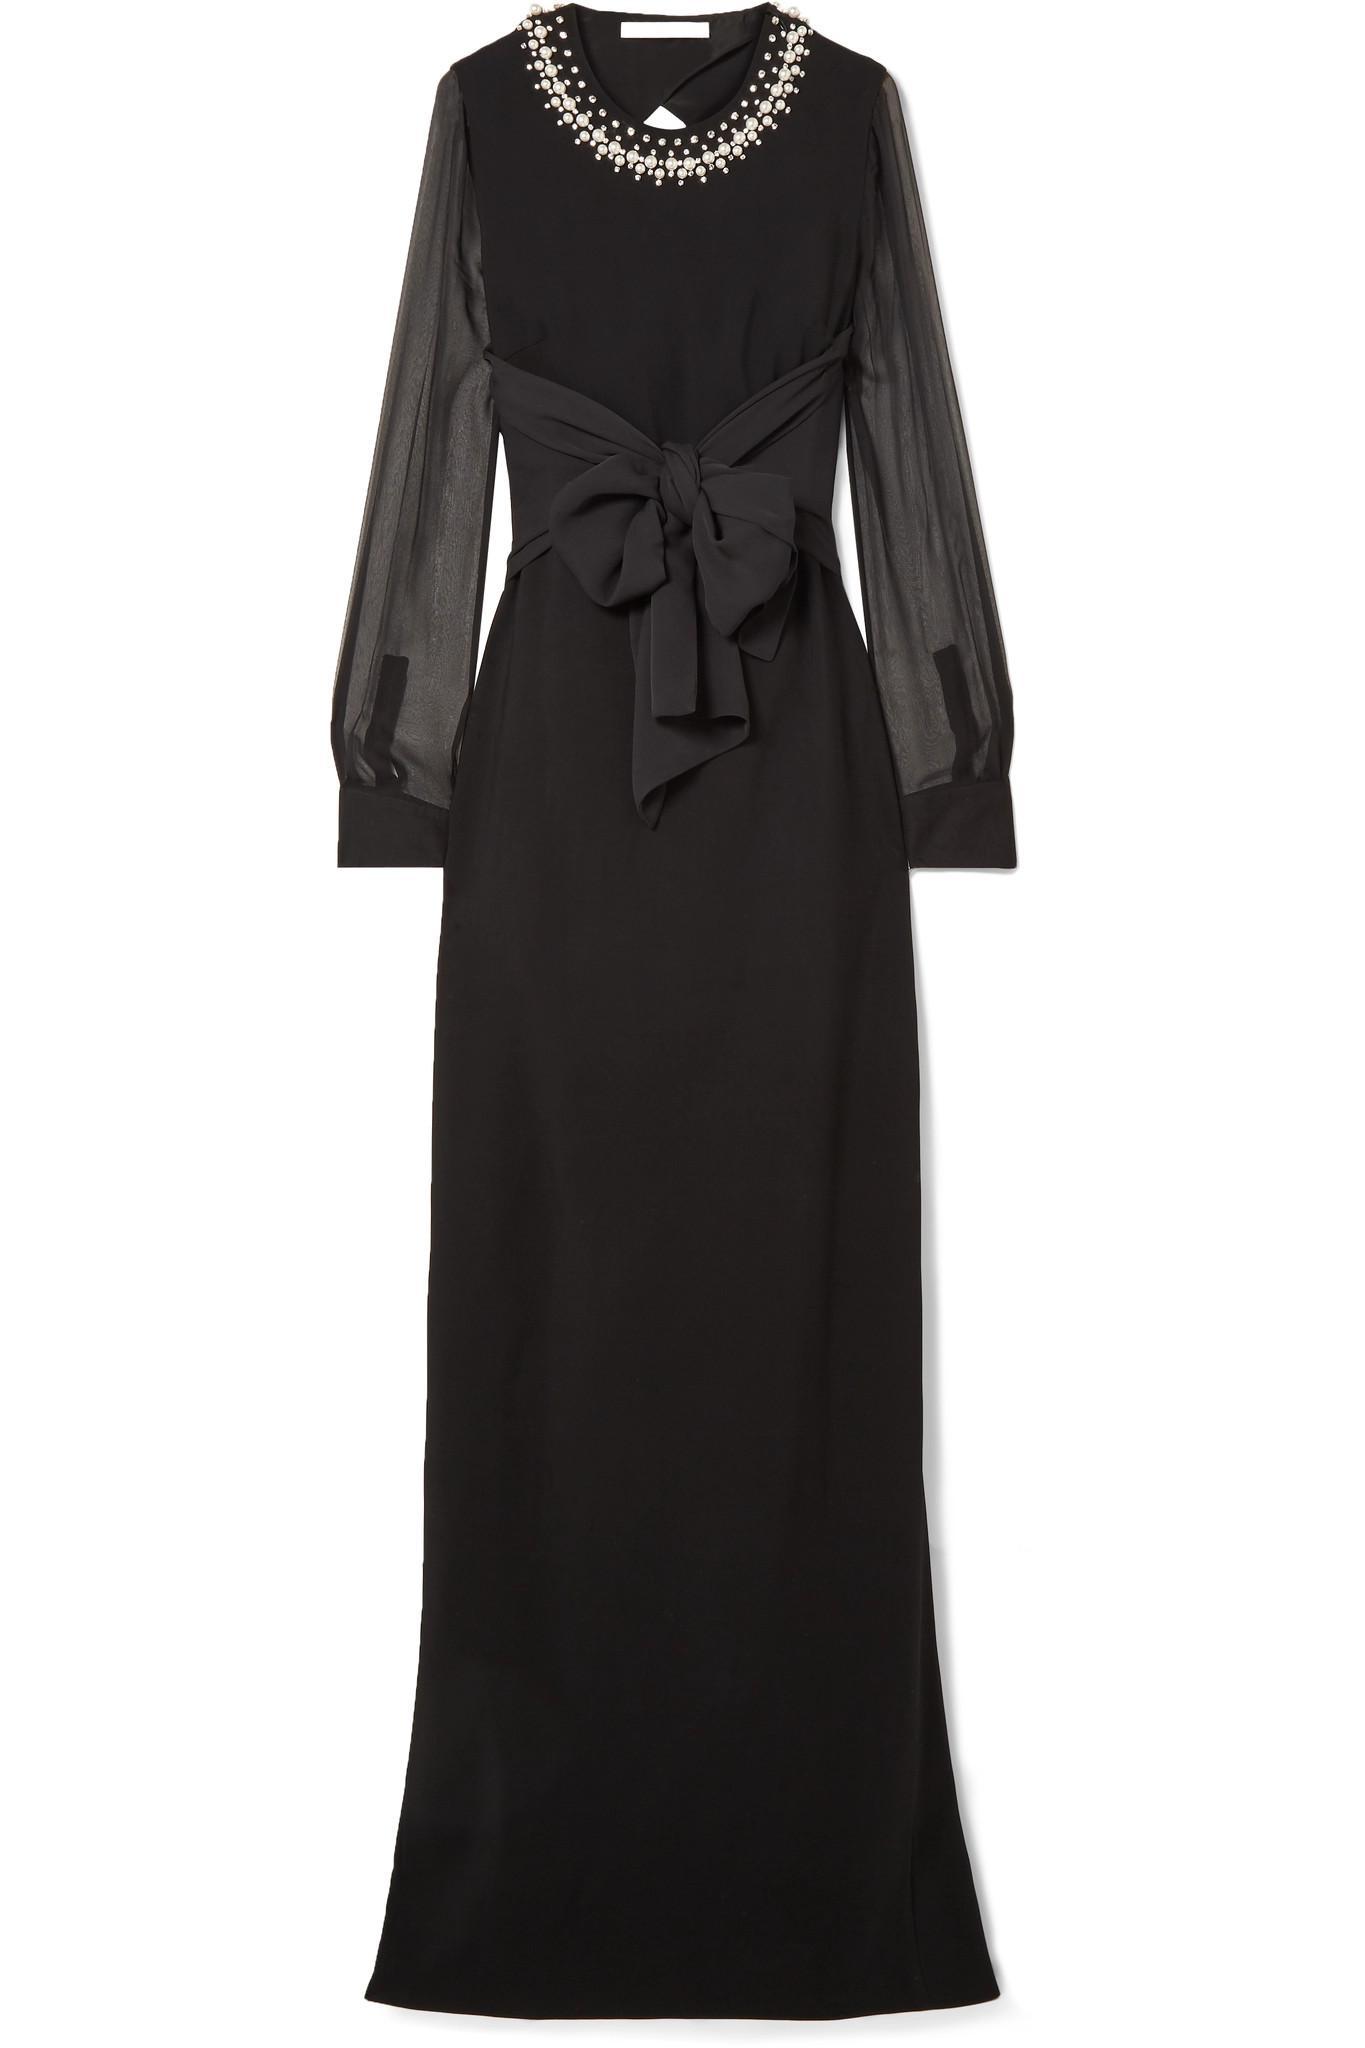 Embelli Soie Et Robe Extensible Cady Garni Tulle - Givenchy Noir 1Dw2i3o